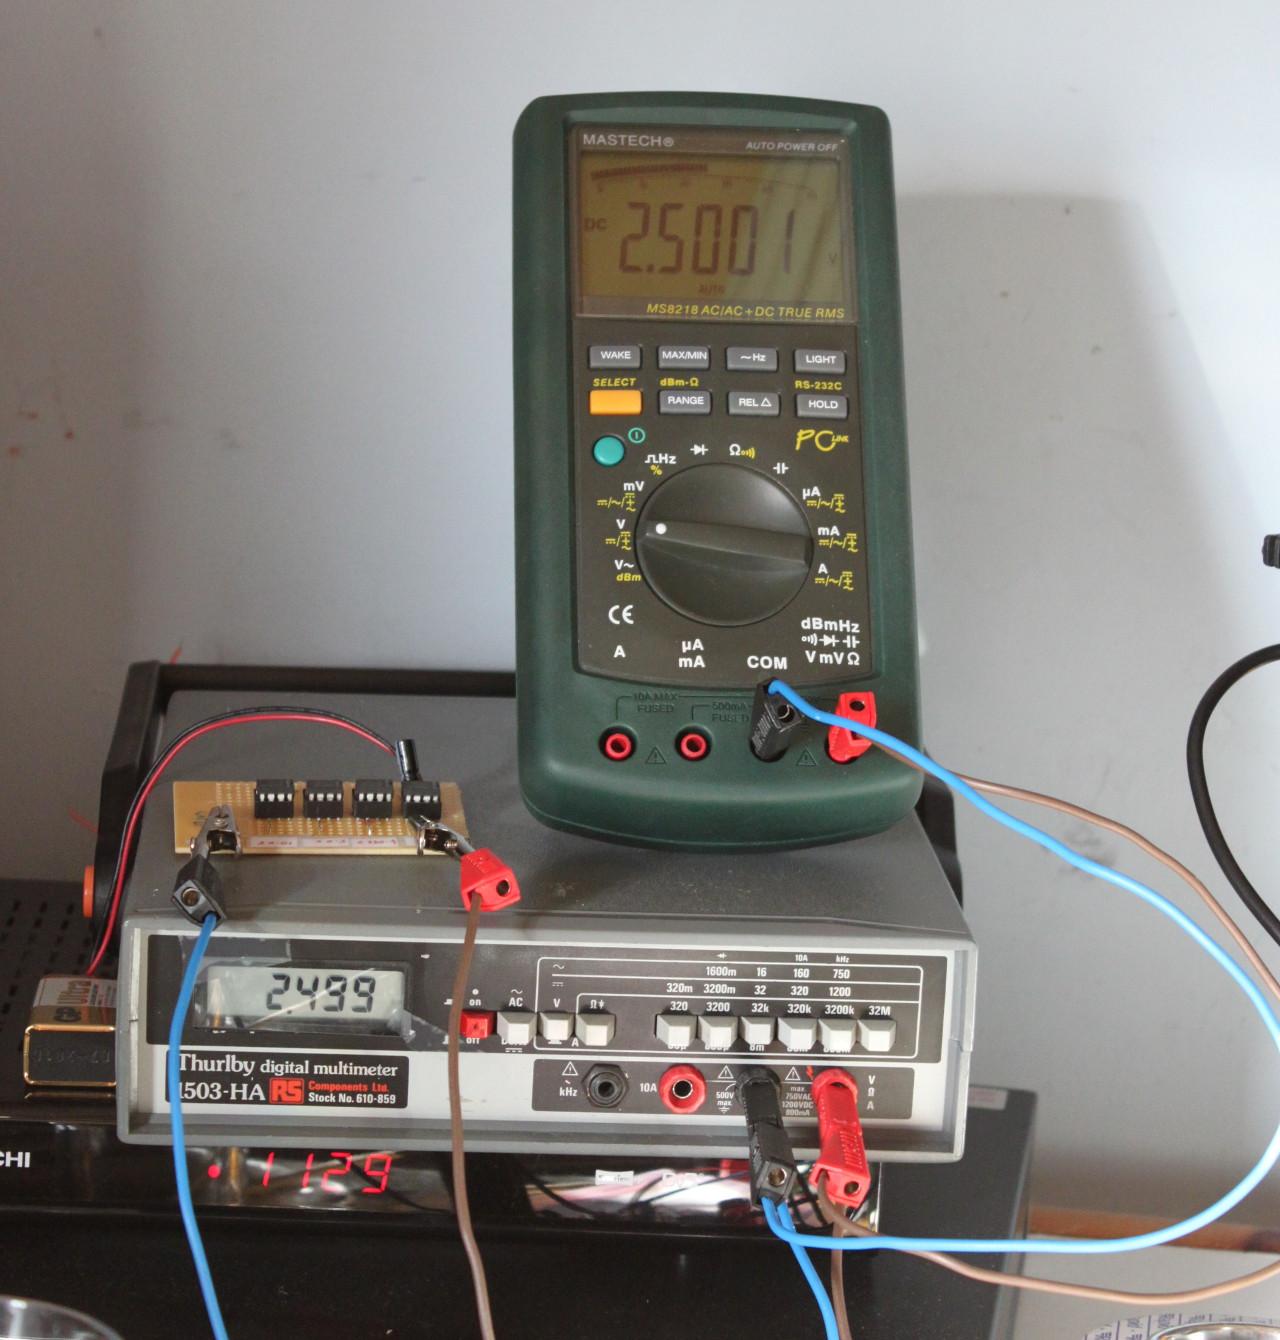 Backlight Hacking Mastech Ms8218 Multimeter